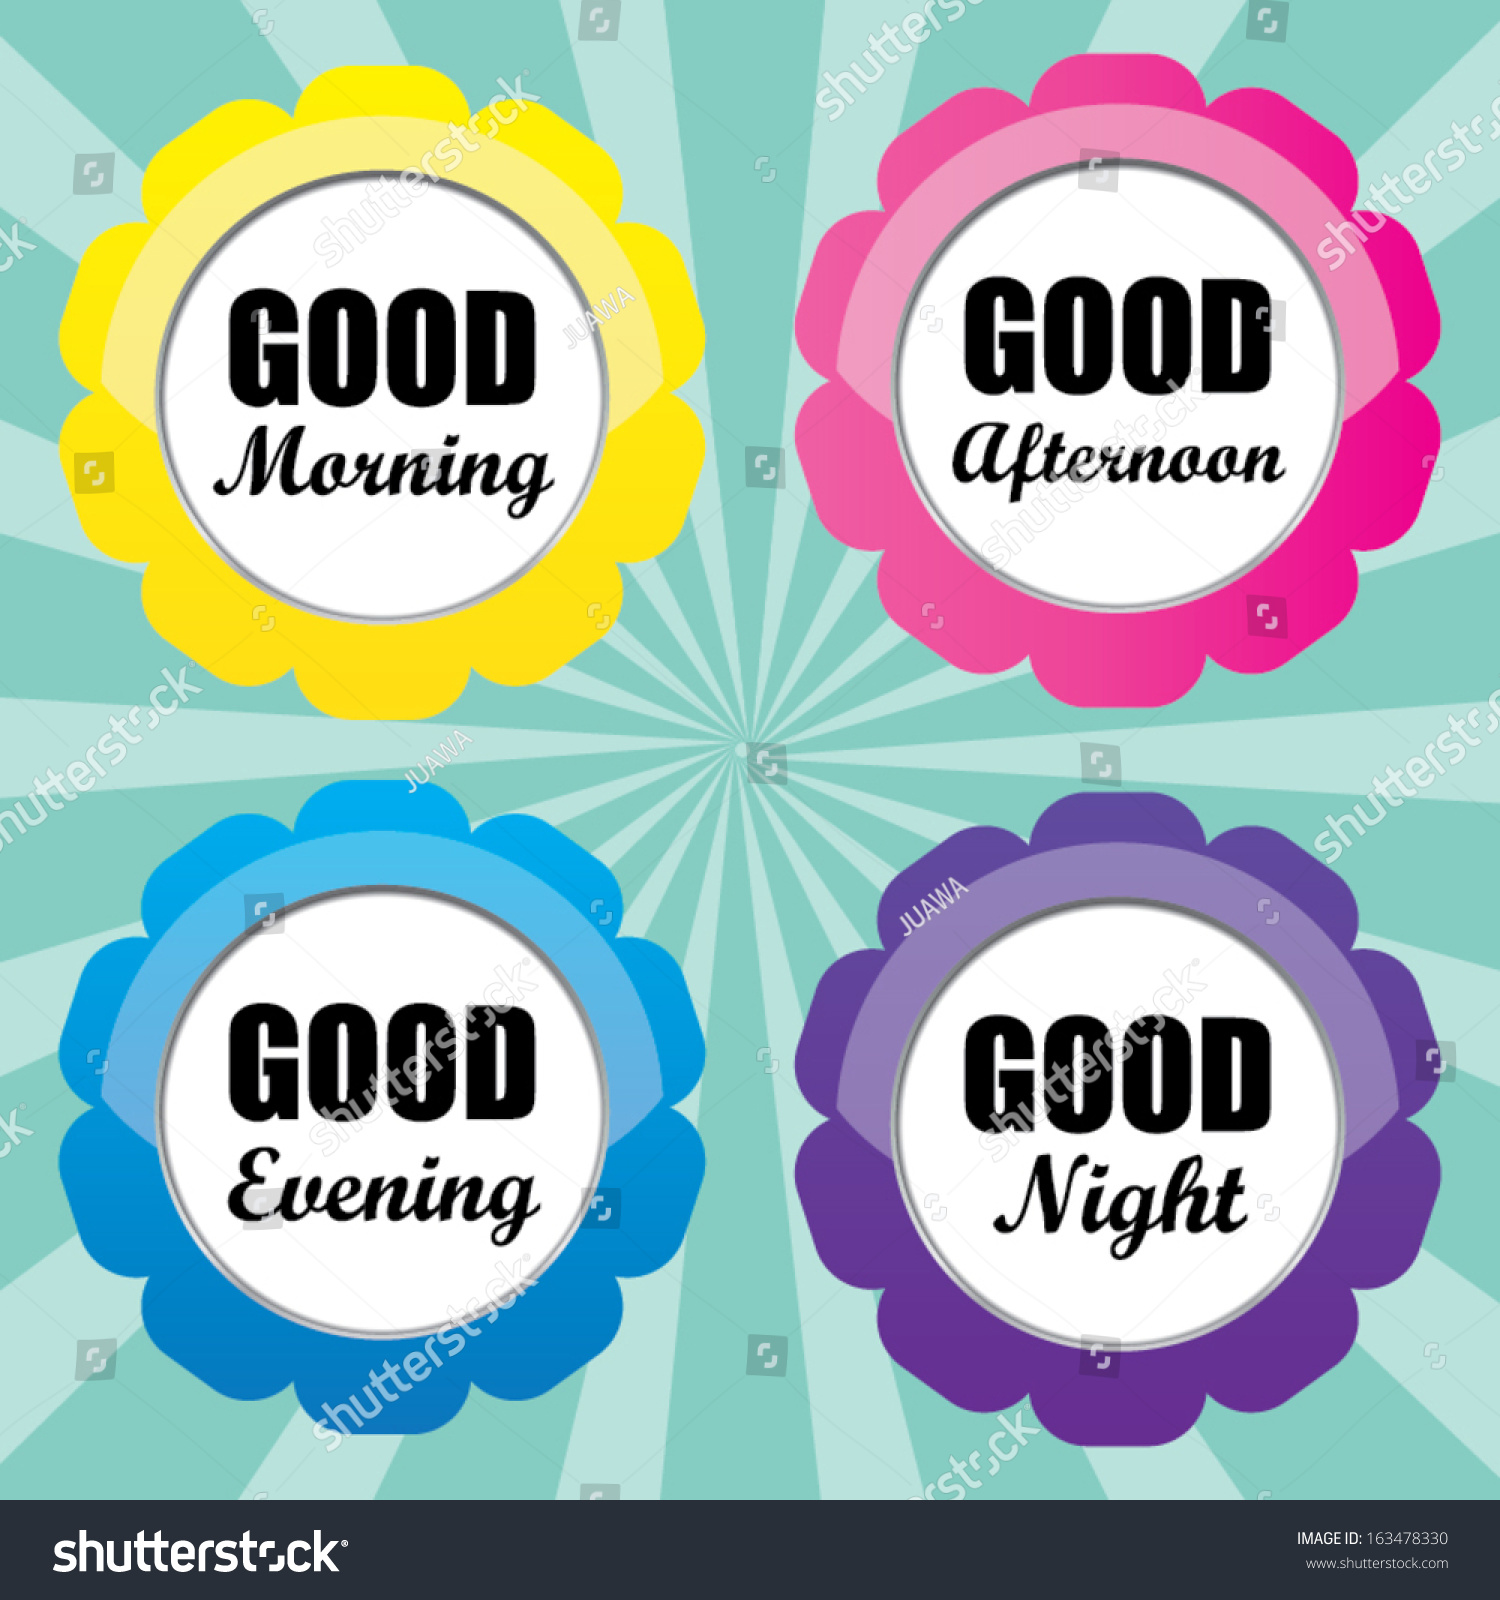 Good Morning Good Afternoon Good Evening Good Night